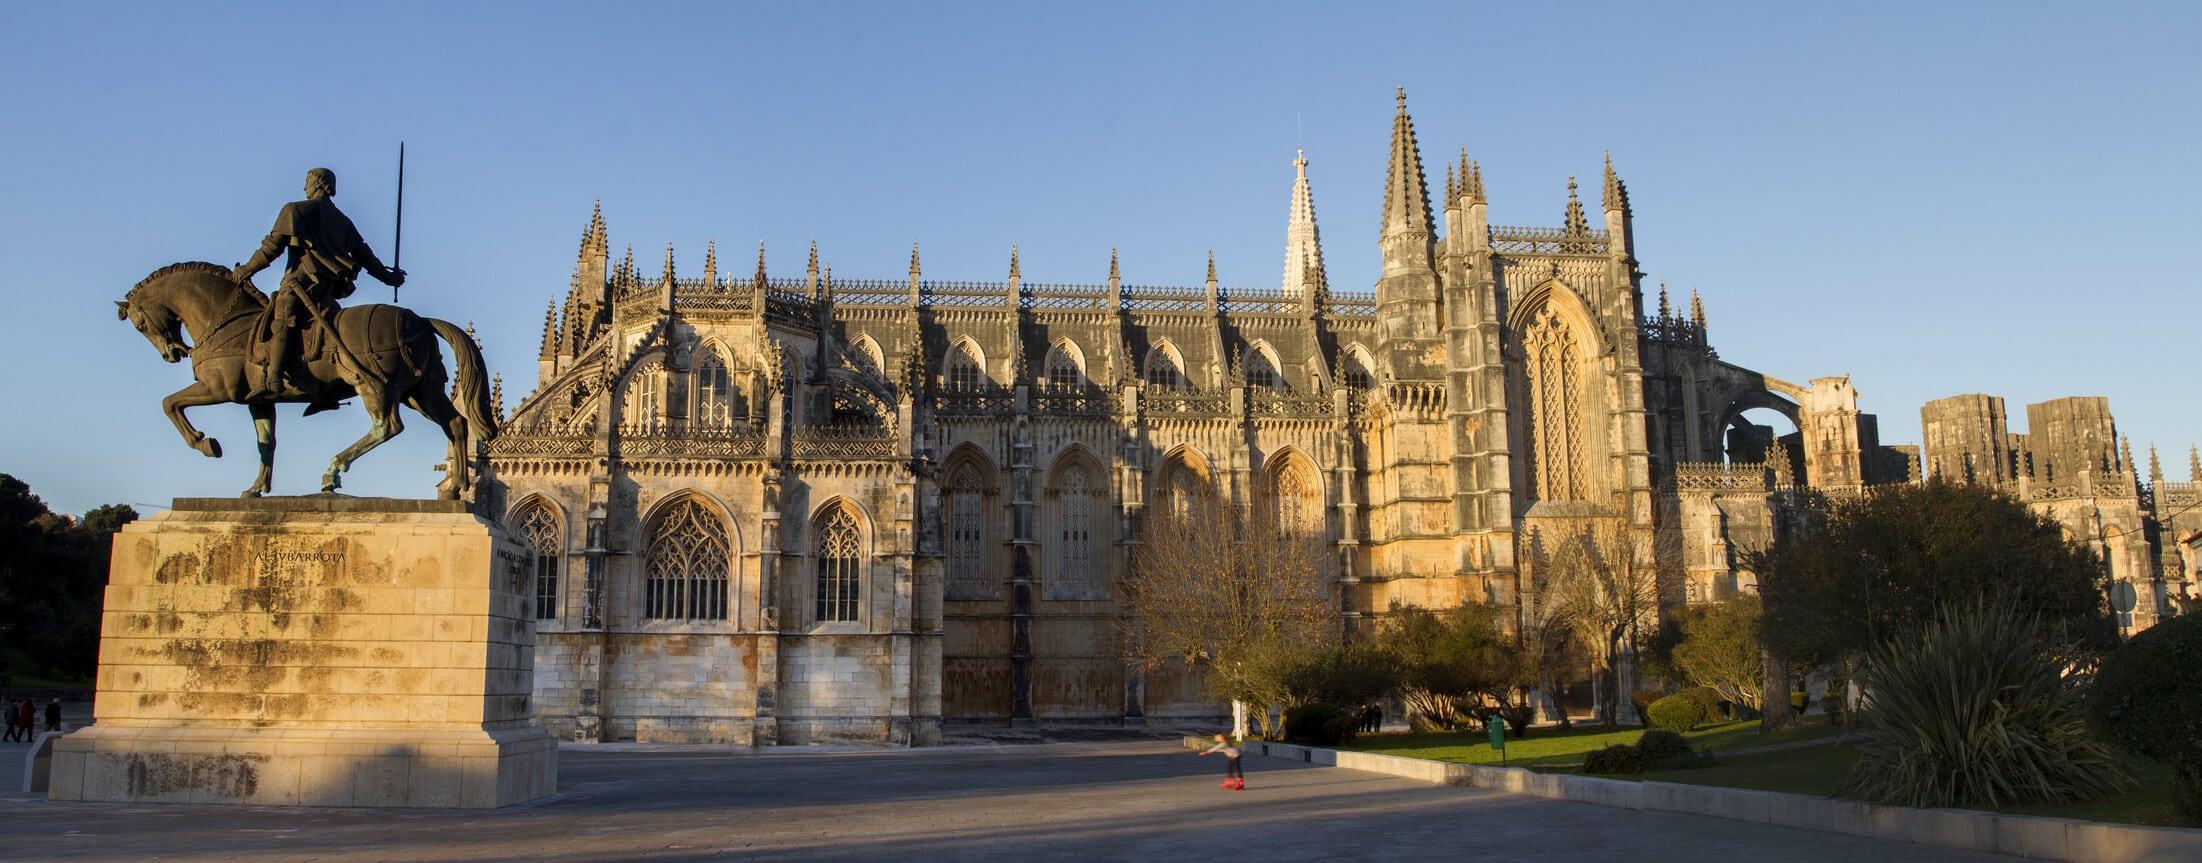 Visit the Monastery of Batalha